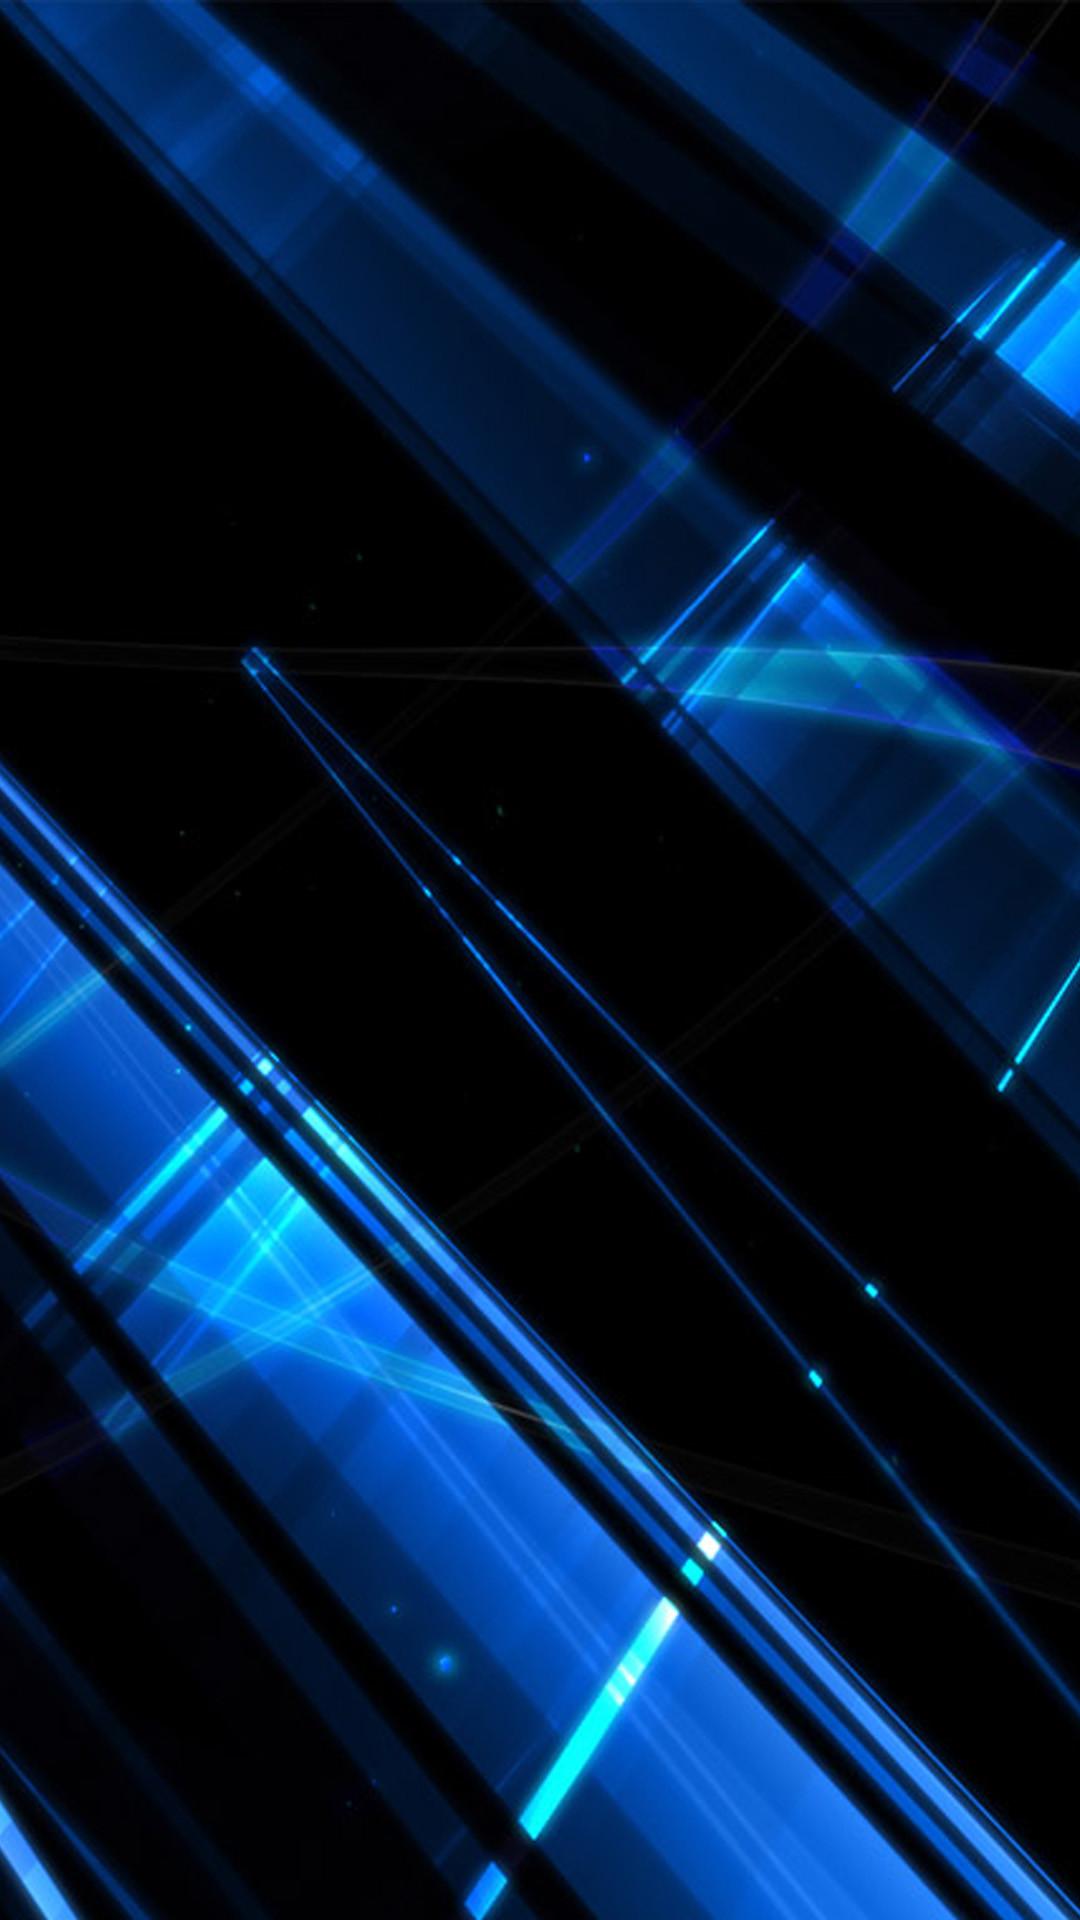 1080x1920 Nexus 7 Wallpaper HD